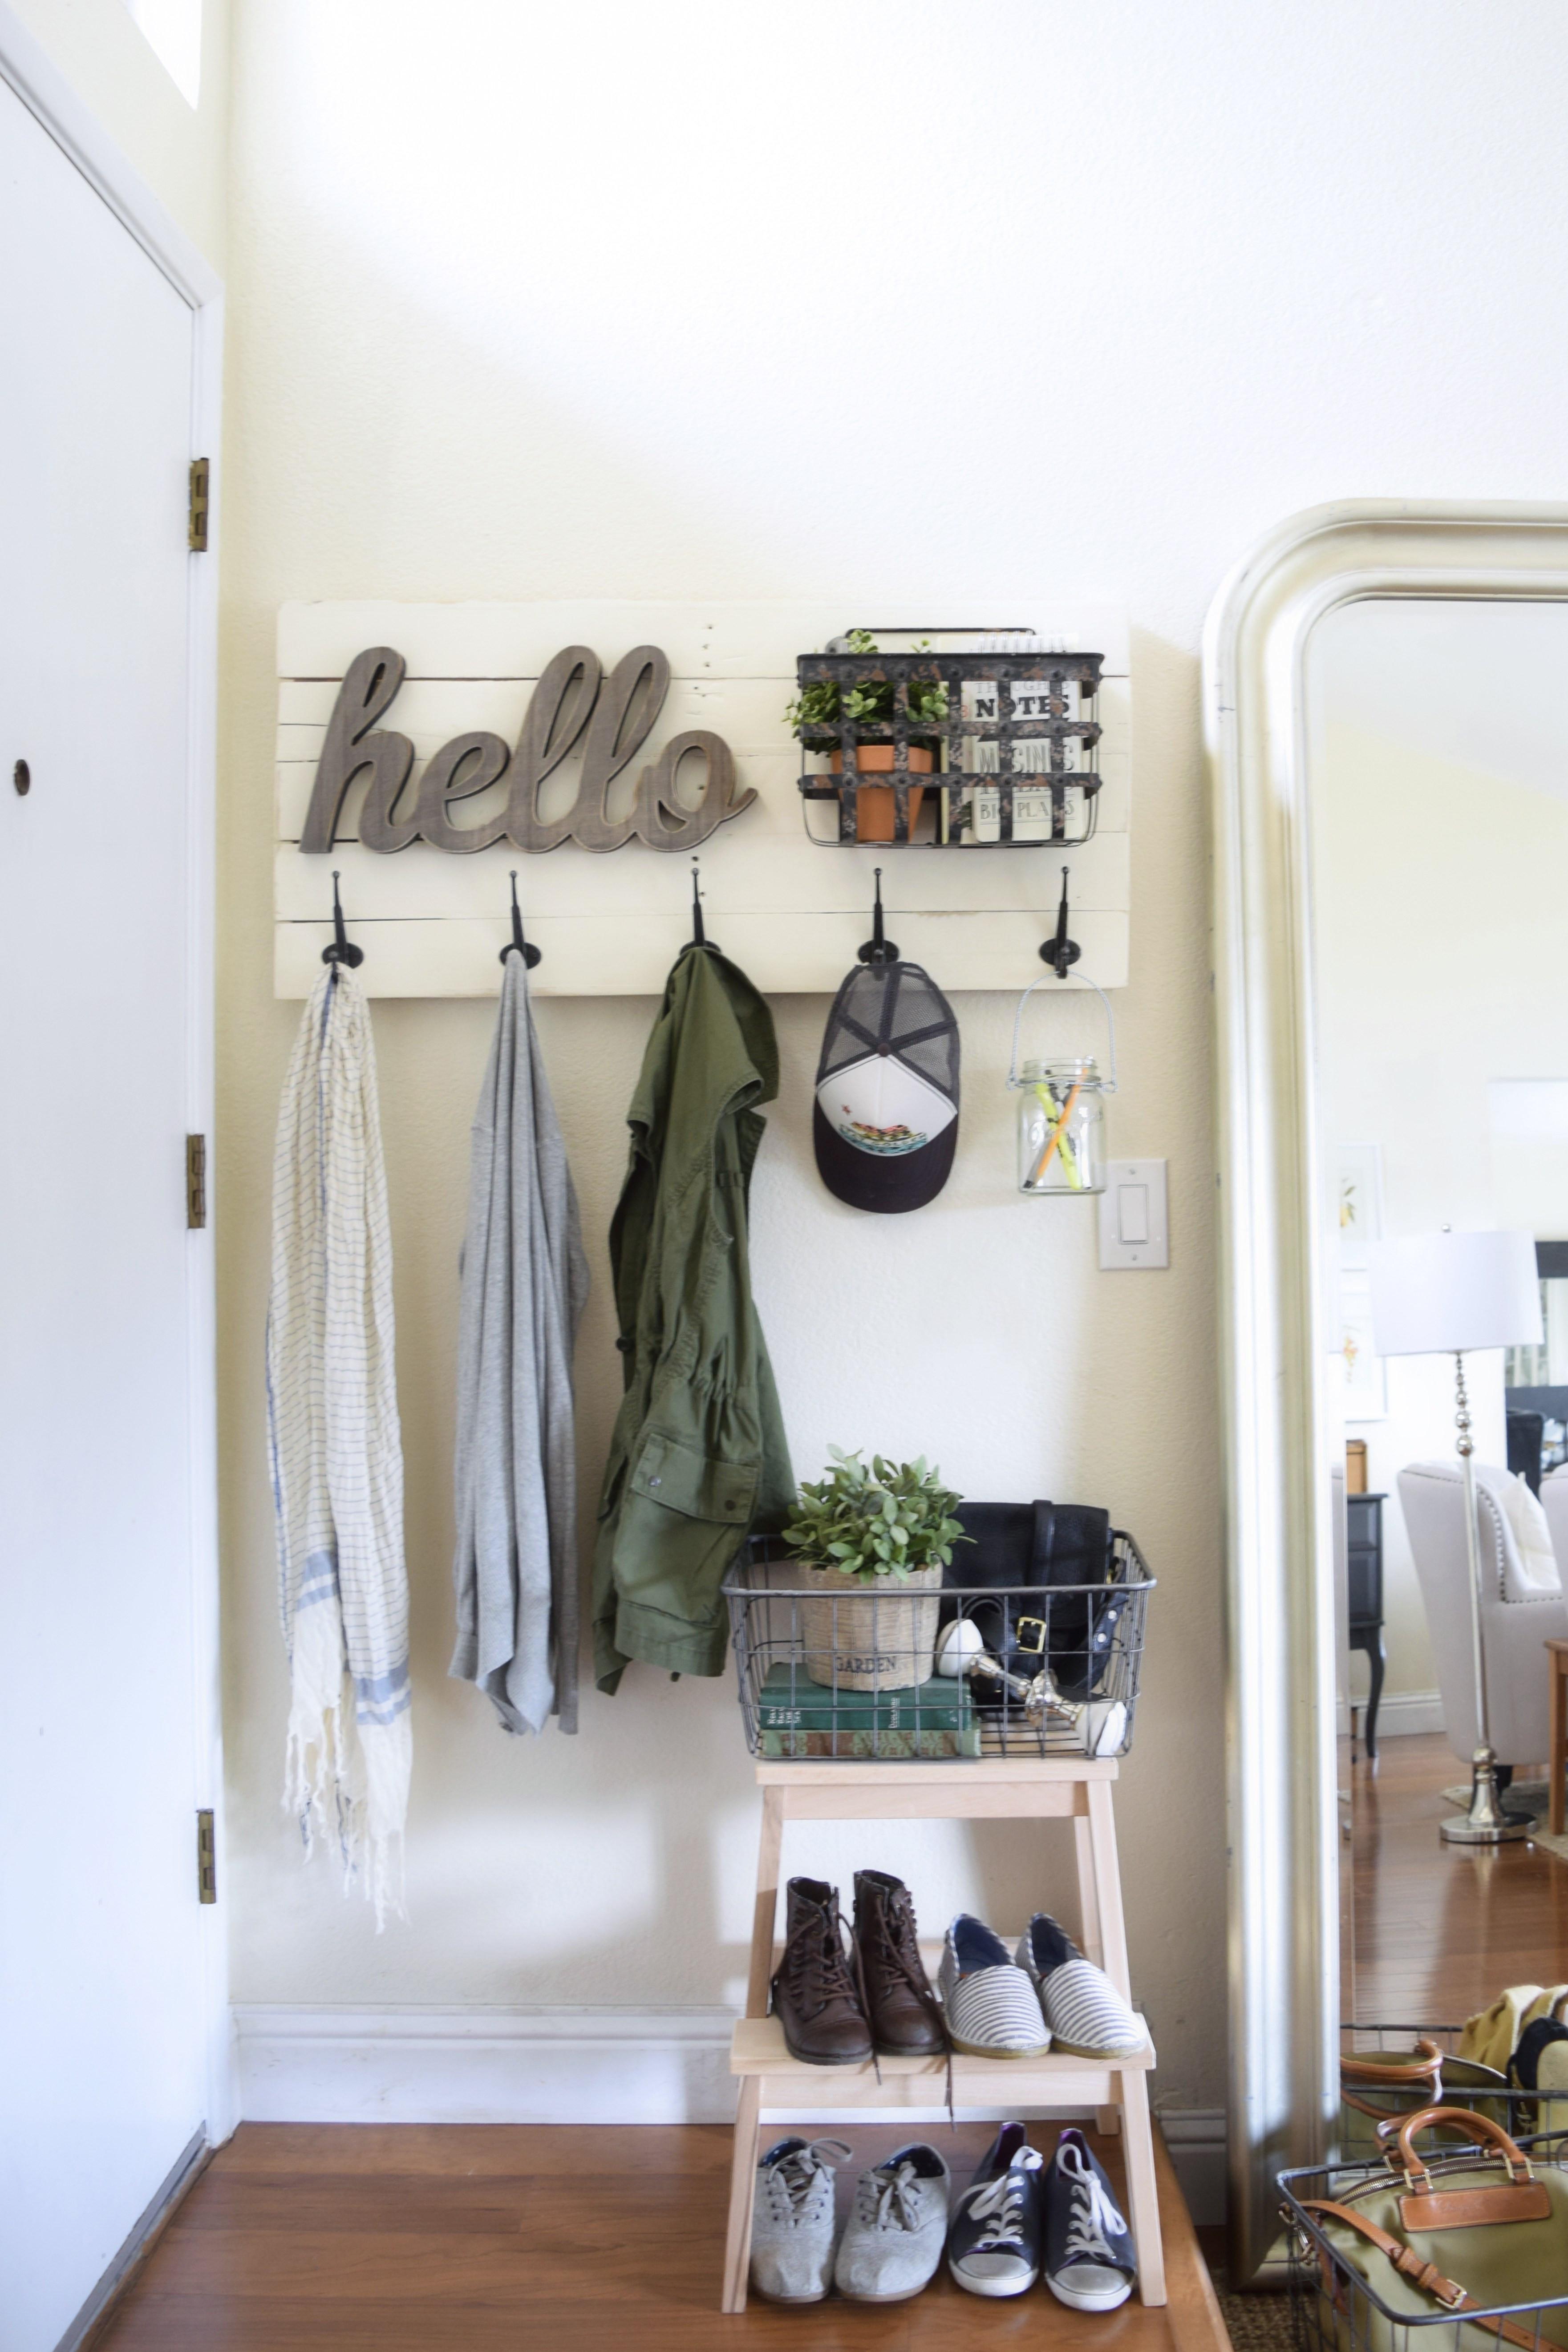 DIY Wall Mounted Coat Rack With Shelf  DIY fun personalized wall mounted coat hanger – almafied